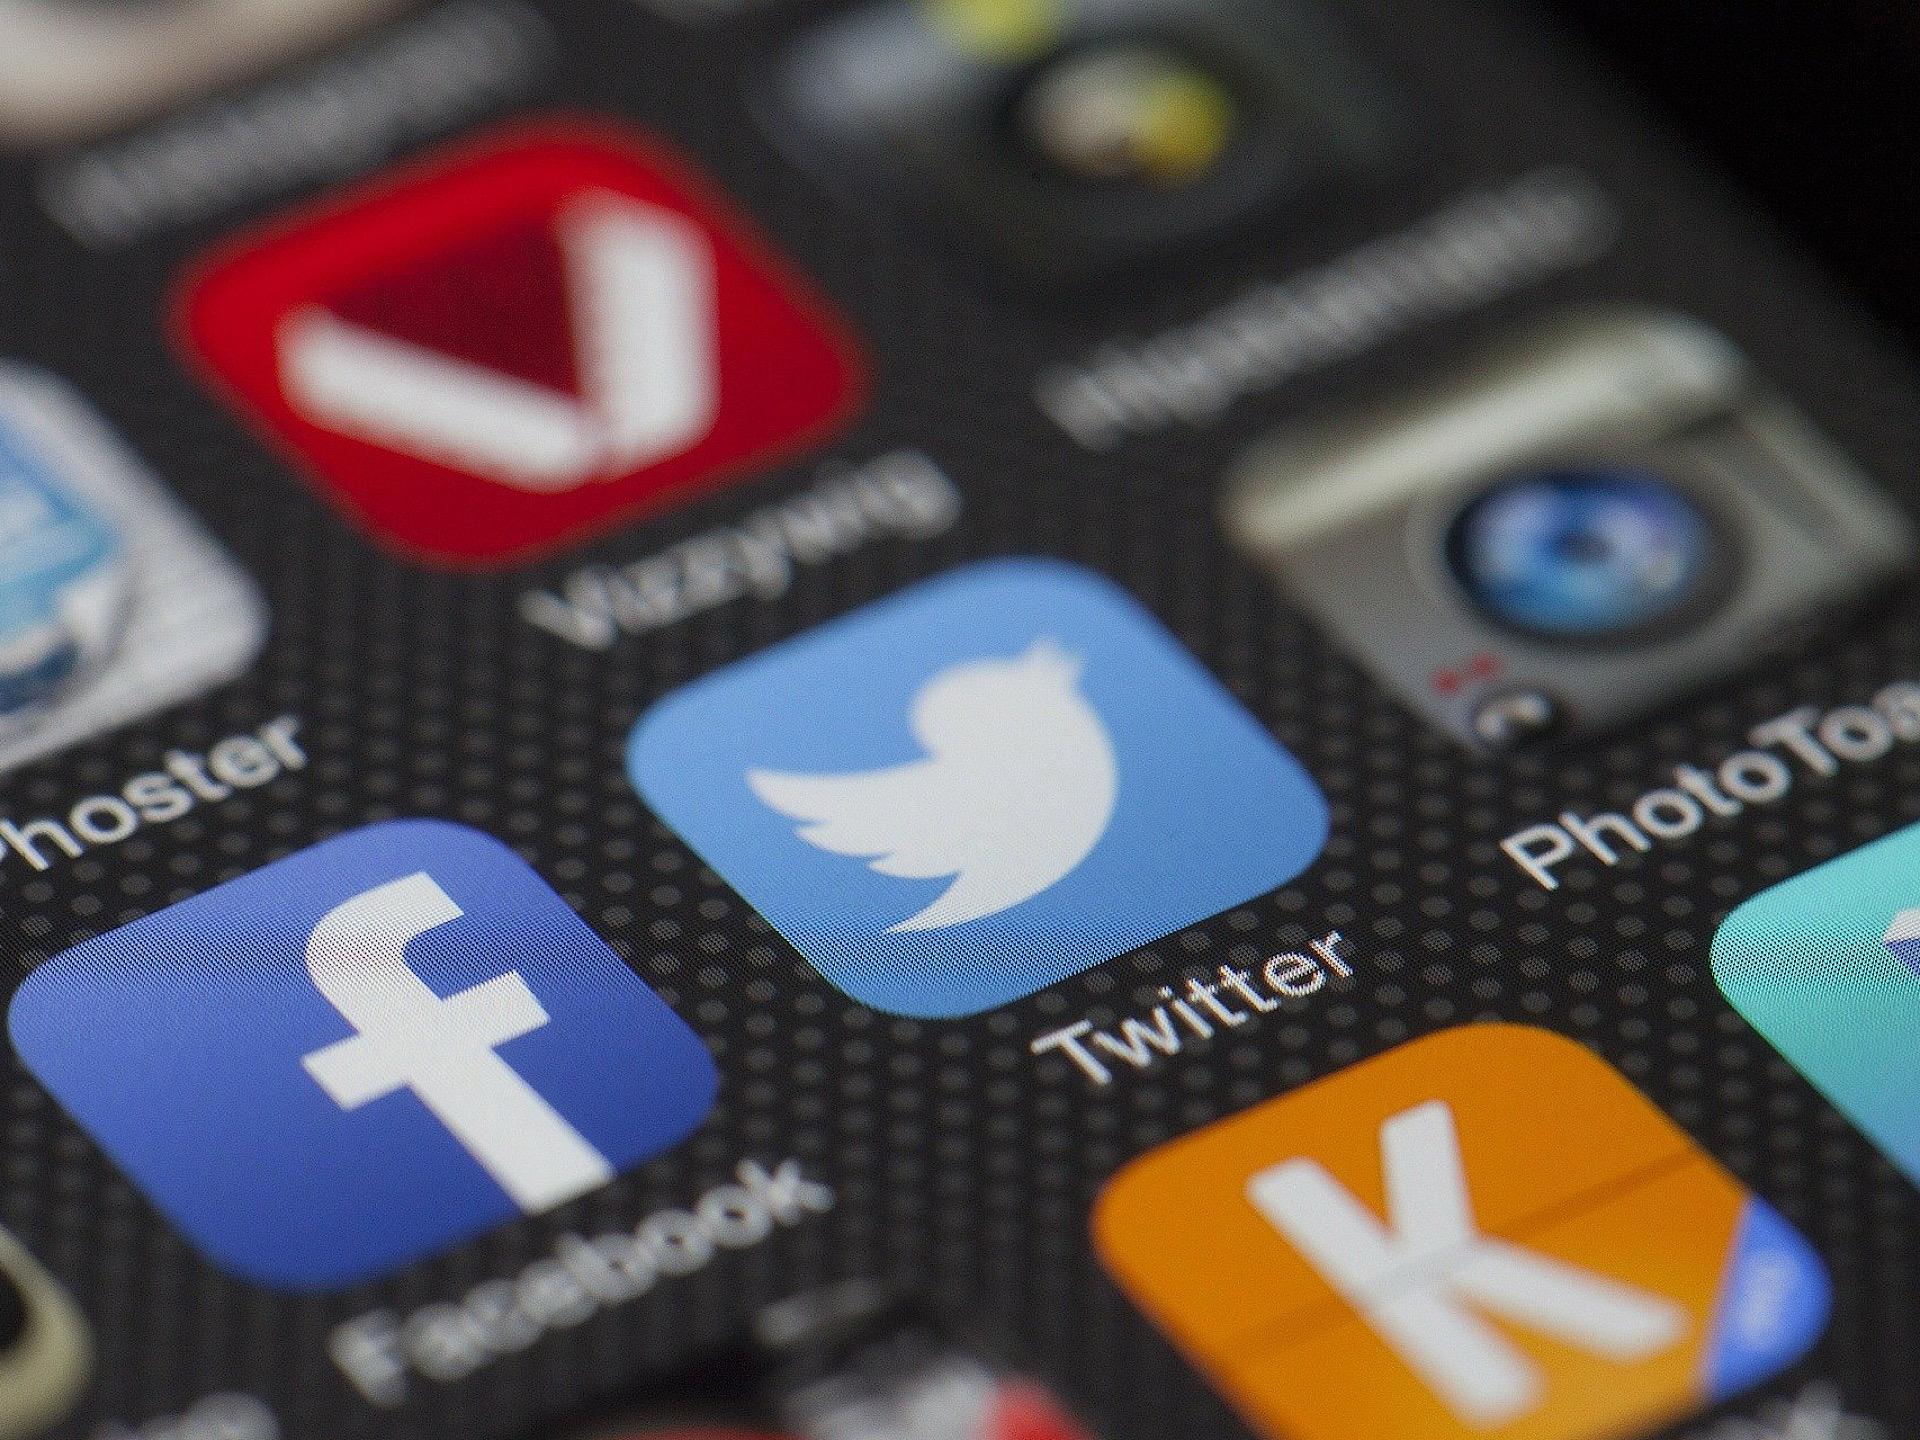 Twitter(ツイッター)で企業アカウントがやりがちな失敗と対策を紹介!